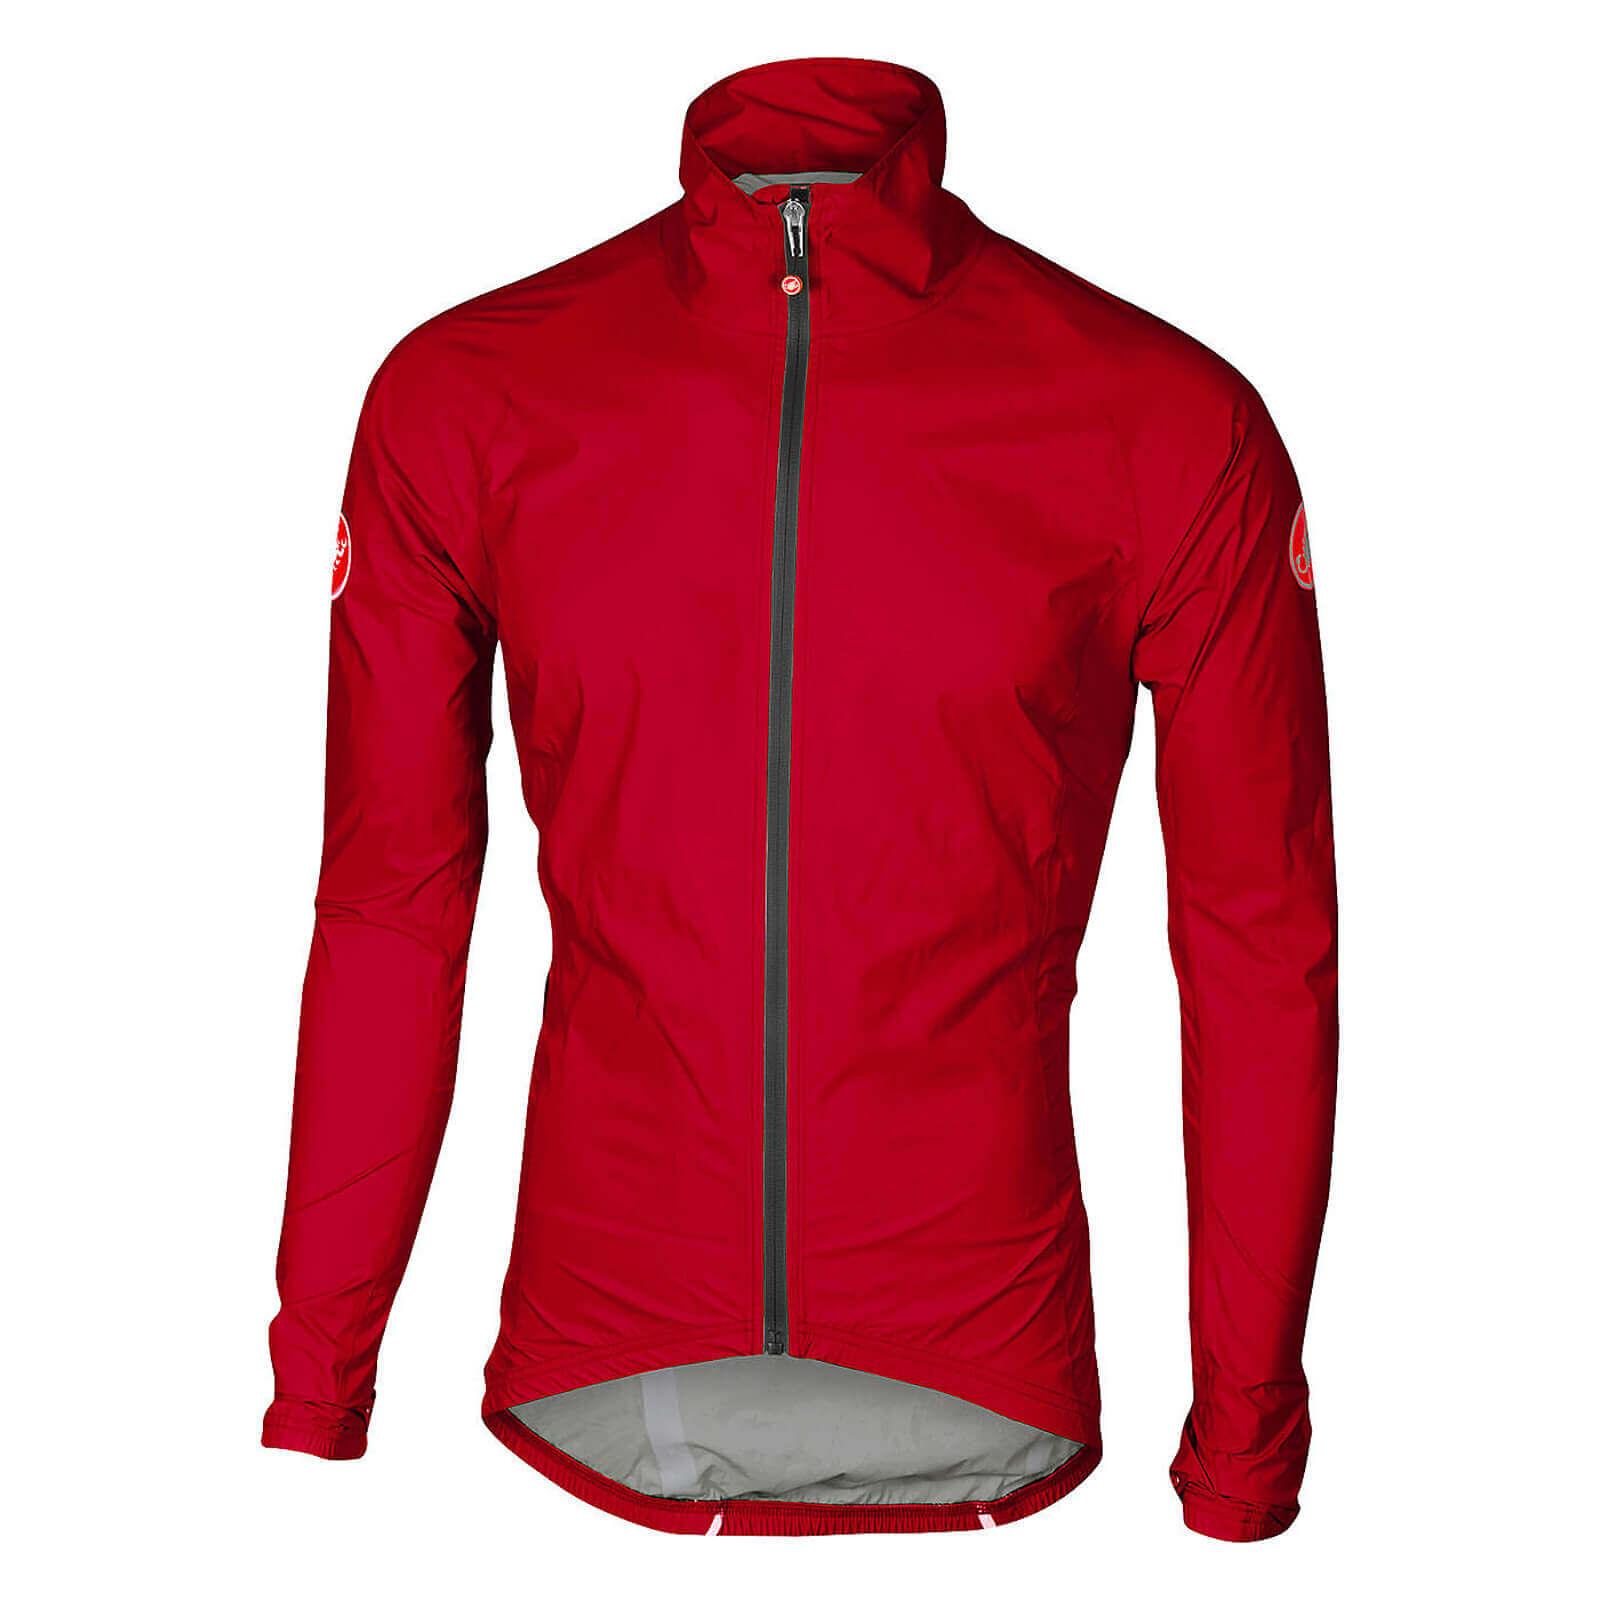 Castelli Emergency Rain Jacket - M - Red